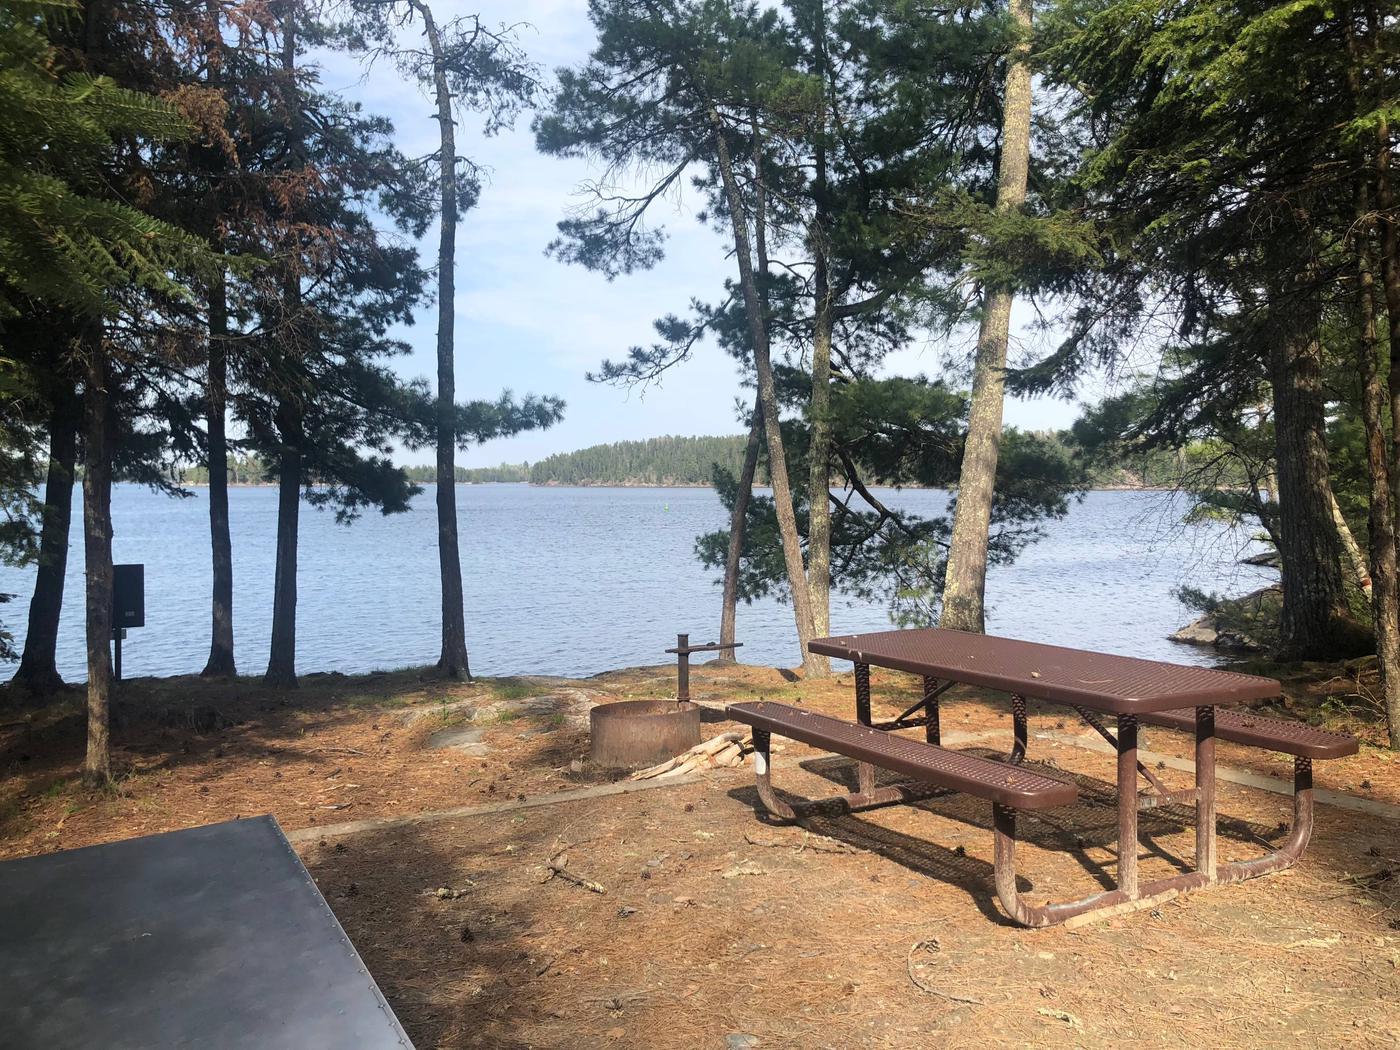 N26 - Namakan Entrance N26 - Namakan Entrance campsite on Namakan Lake